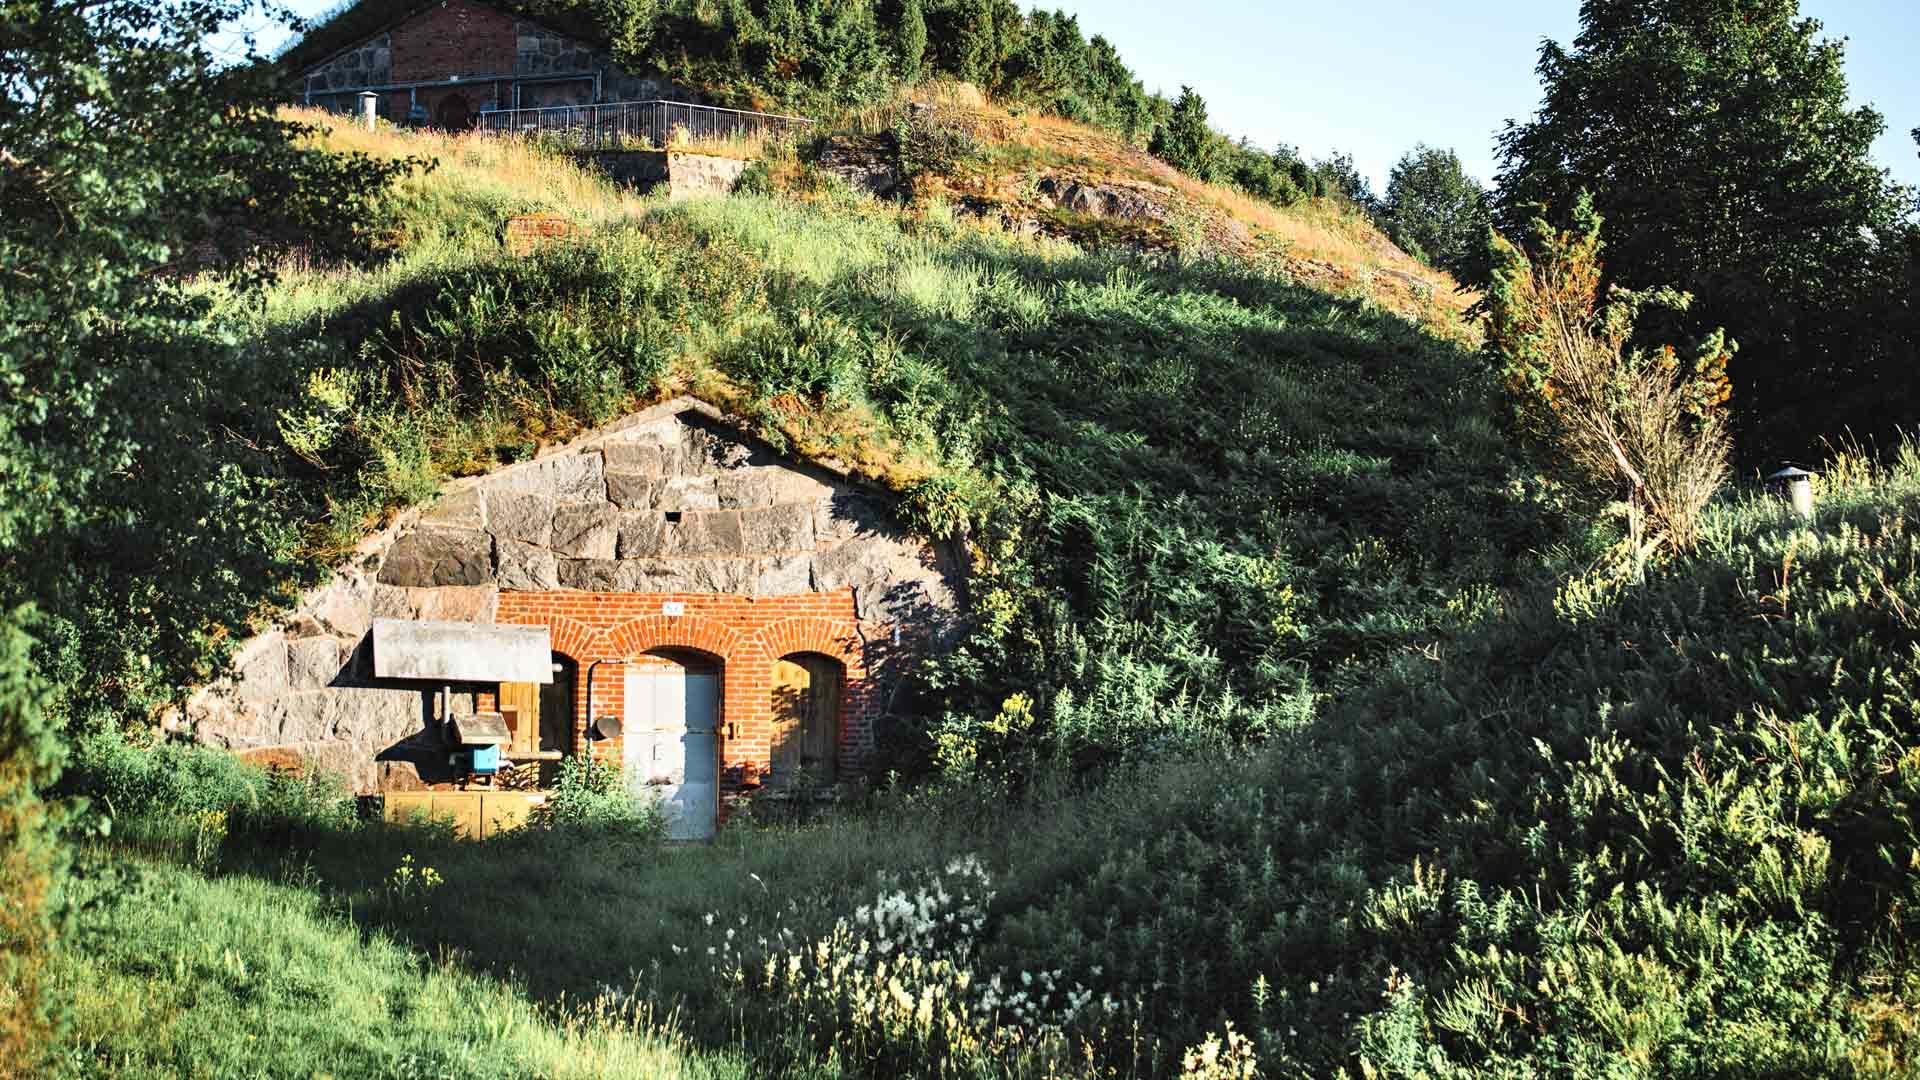 Vallisaaren vanha linnoitus